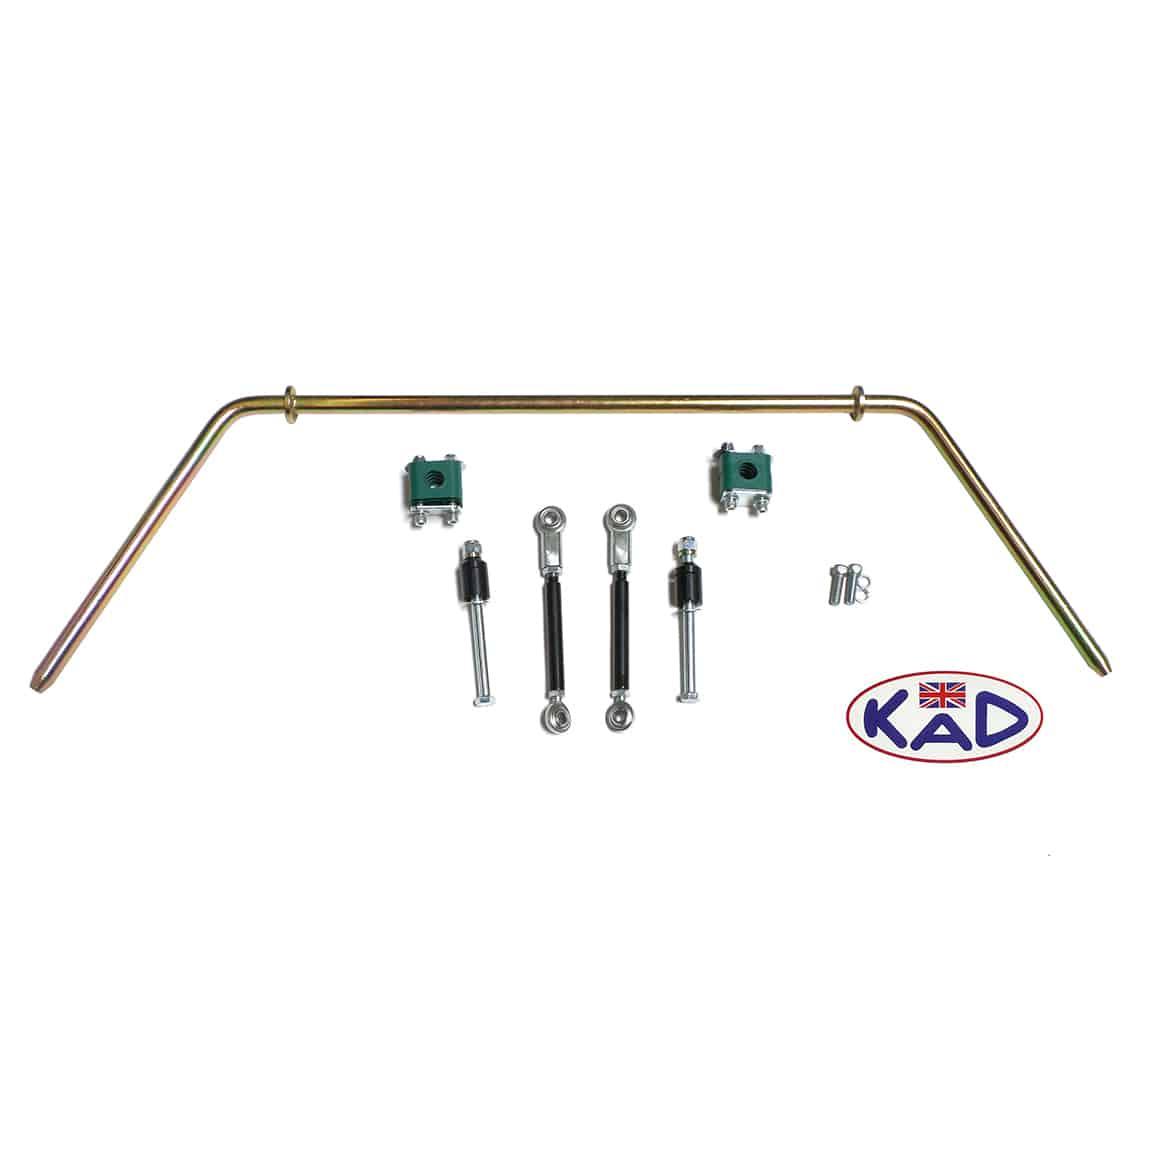 KAD Front Anti-Roll Bar (KAD1013209)